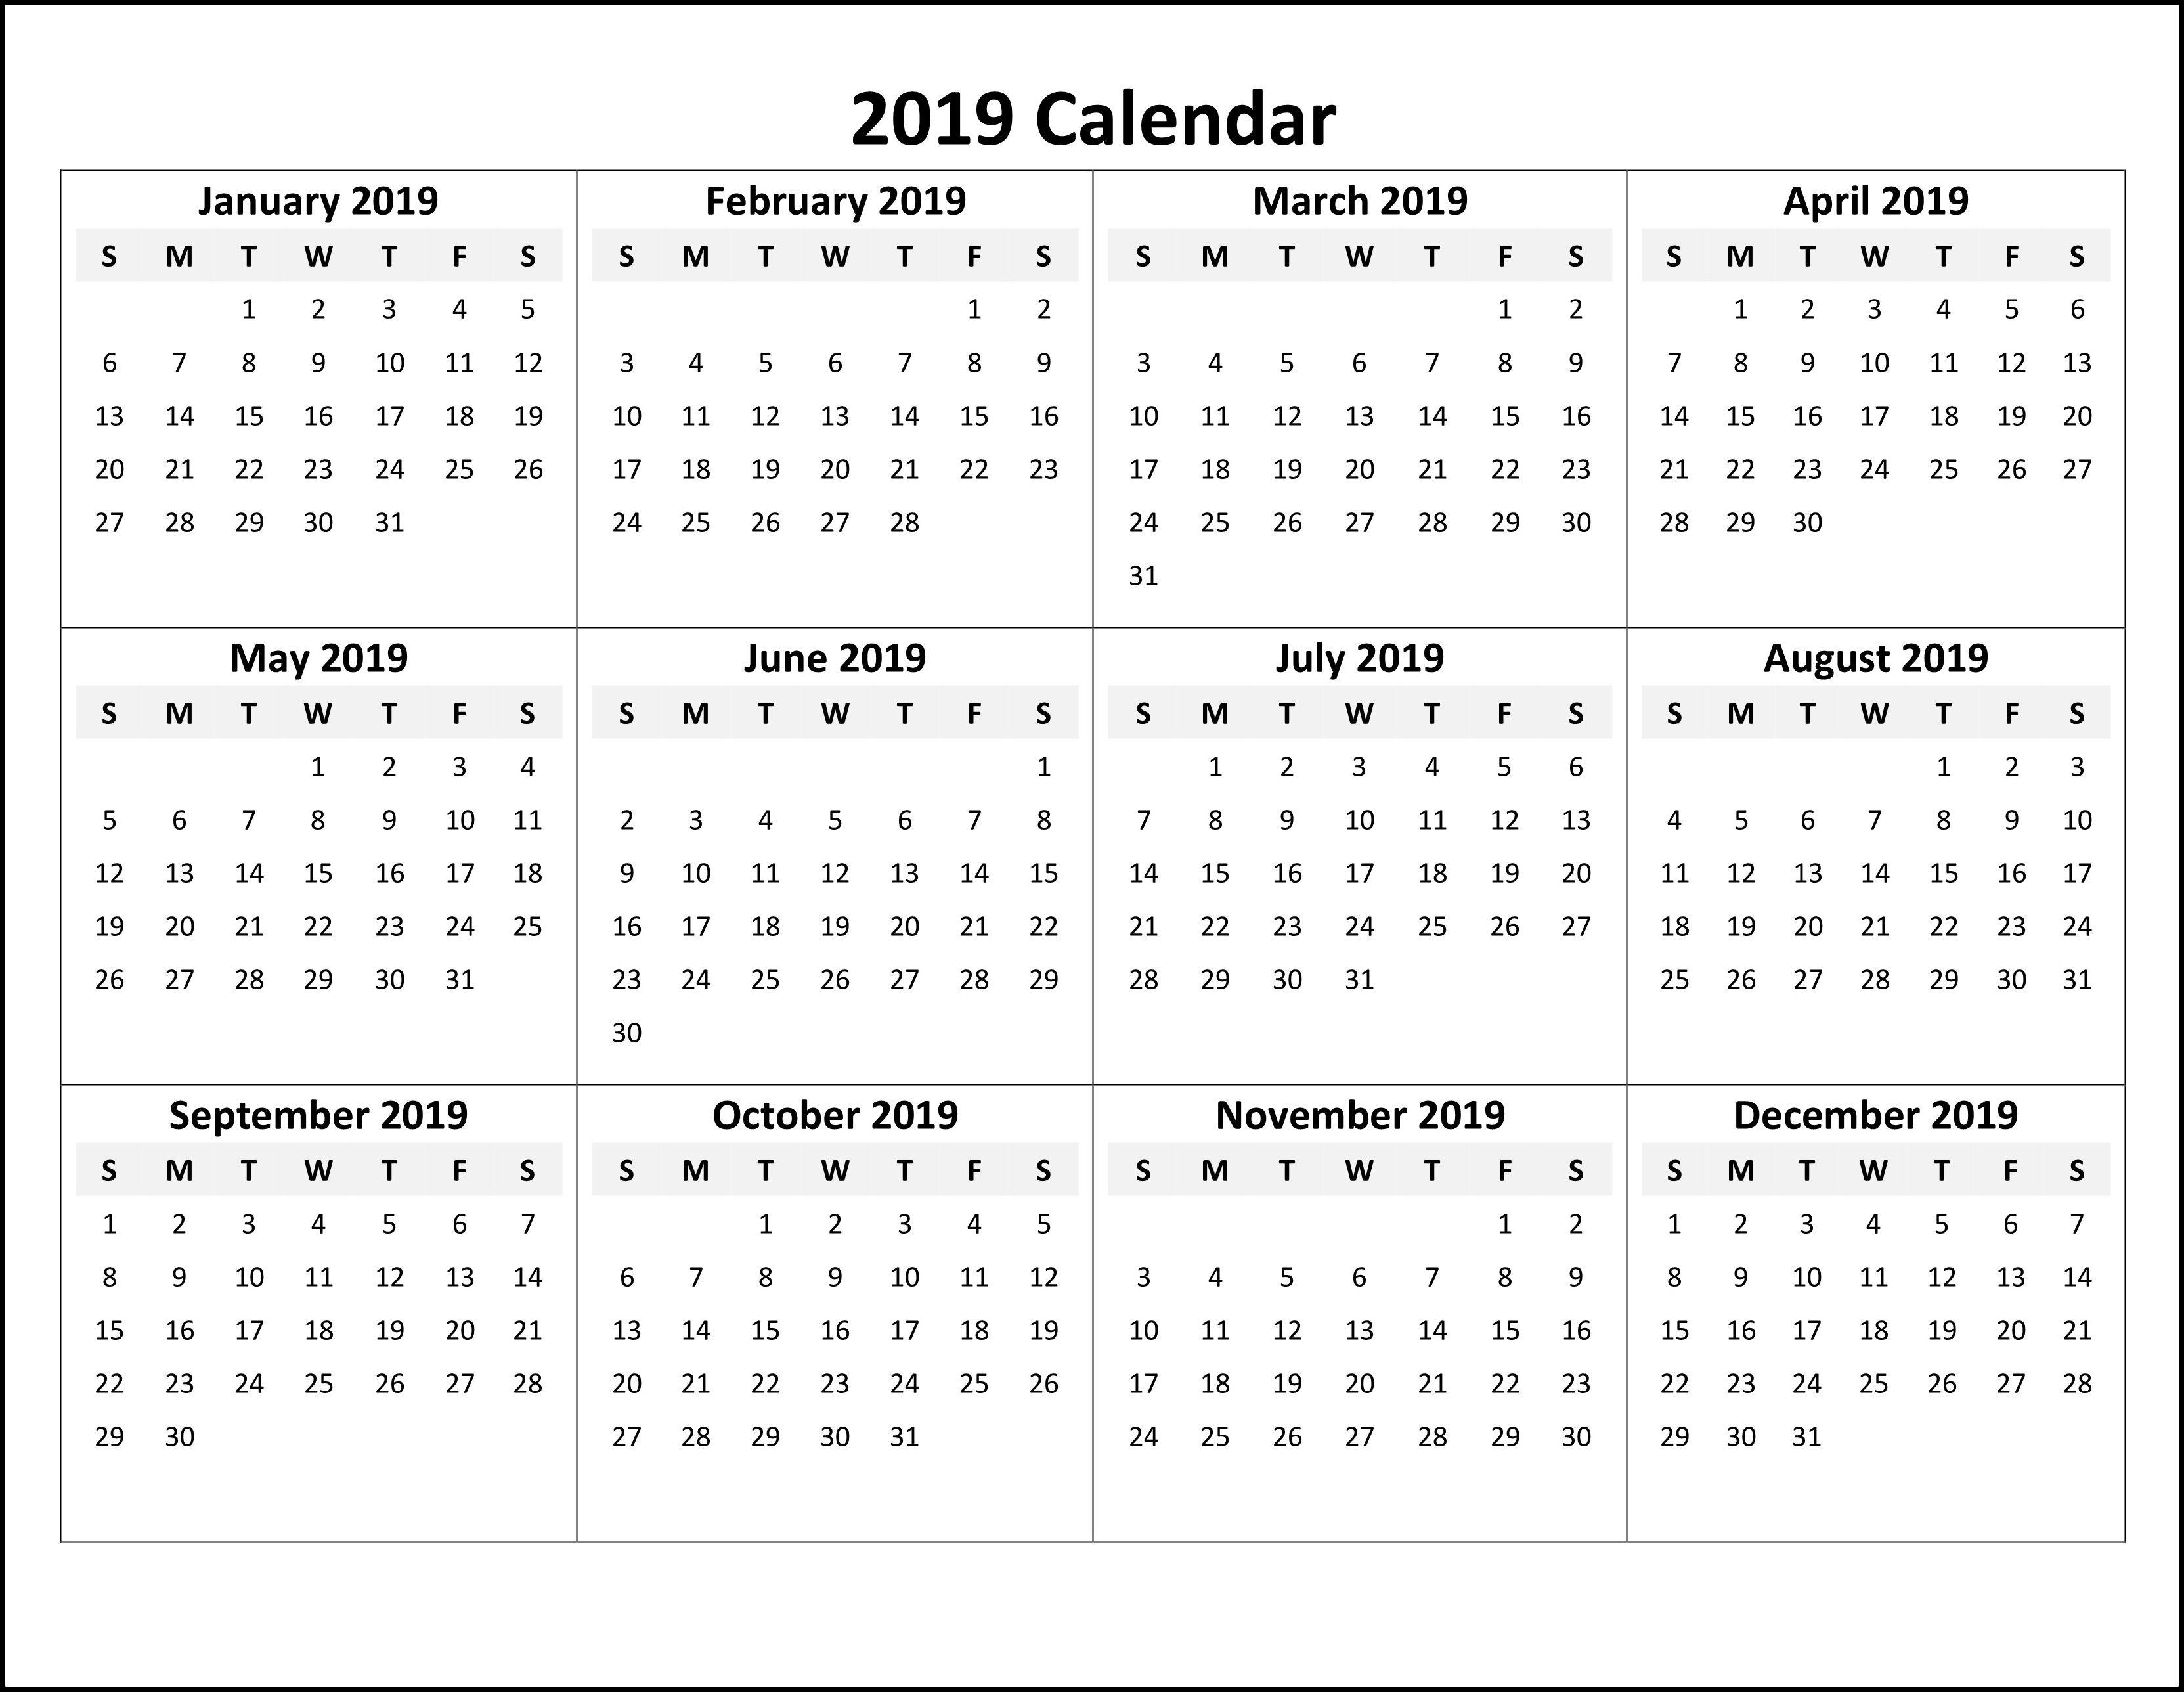 Print Online Calendar 2019 Online Printable Calendar 2019 #calendar2019